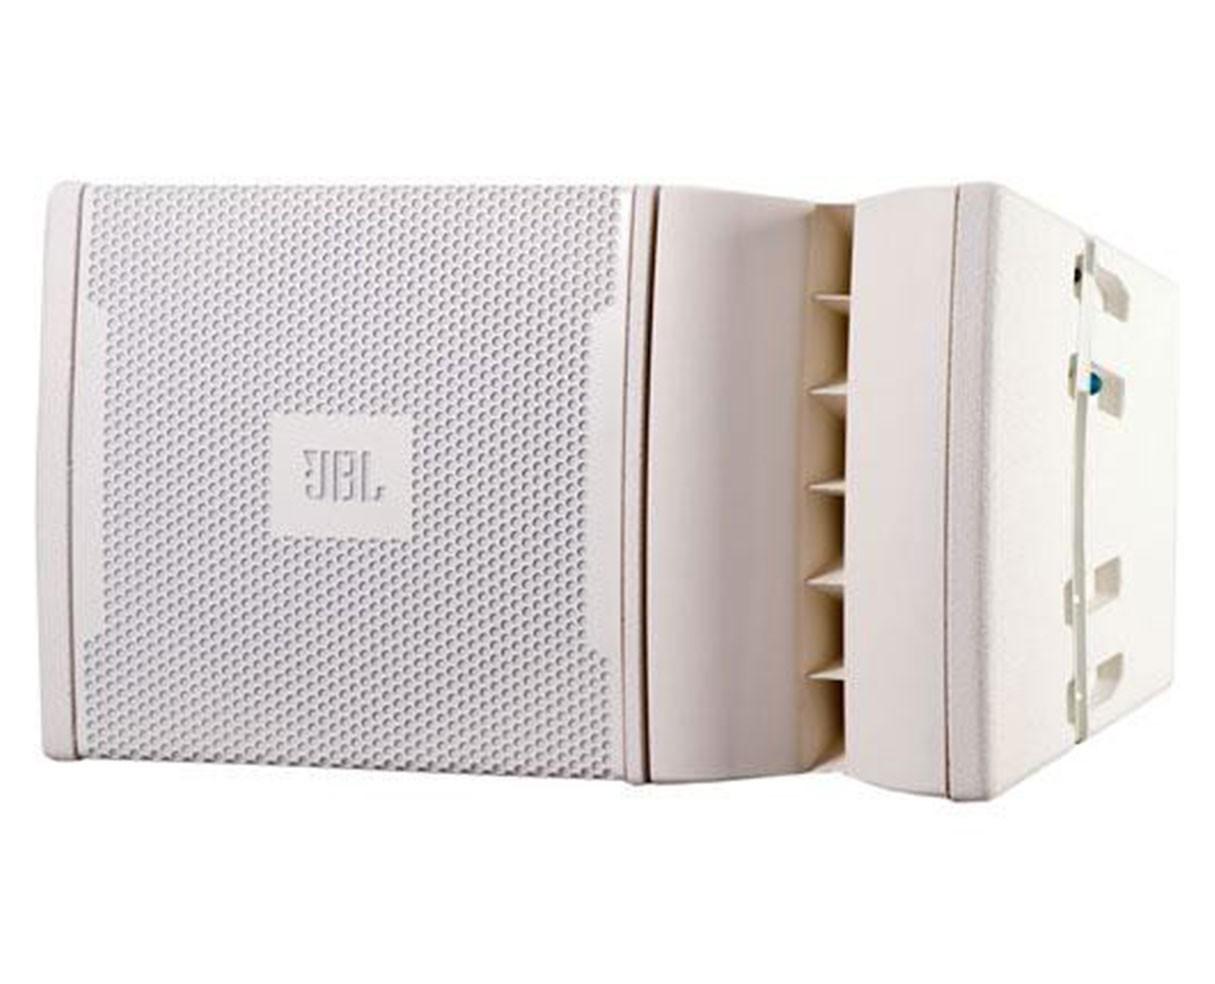 JBL VRX932LA-1 (White)